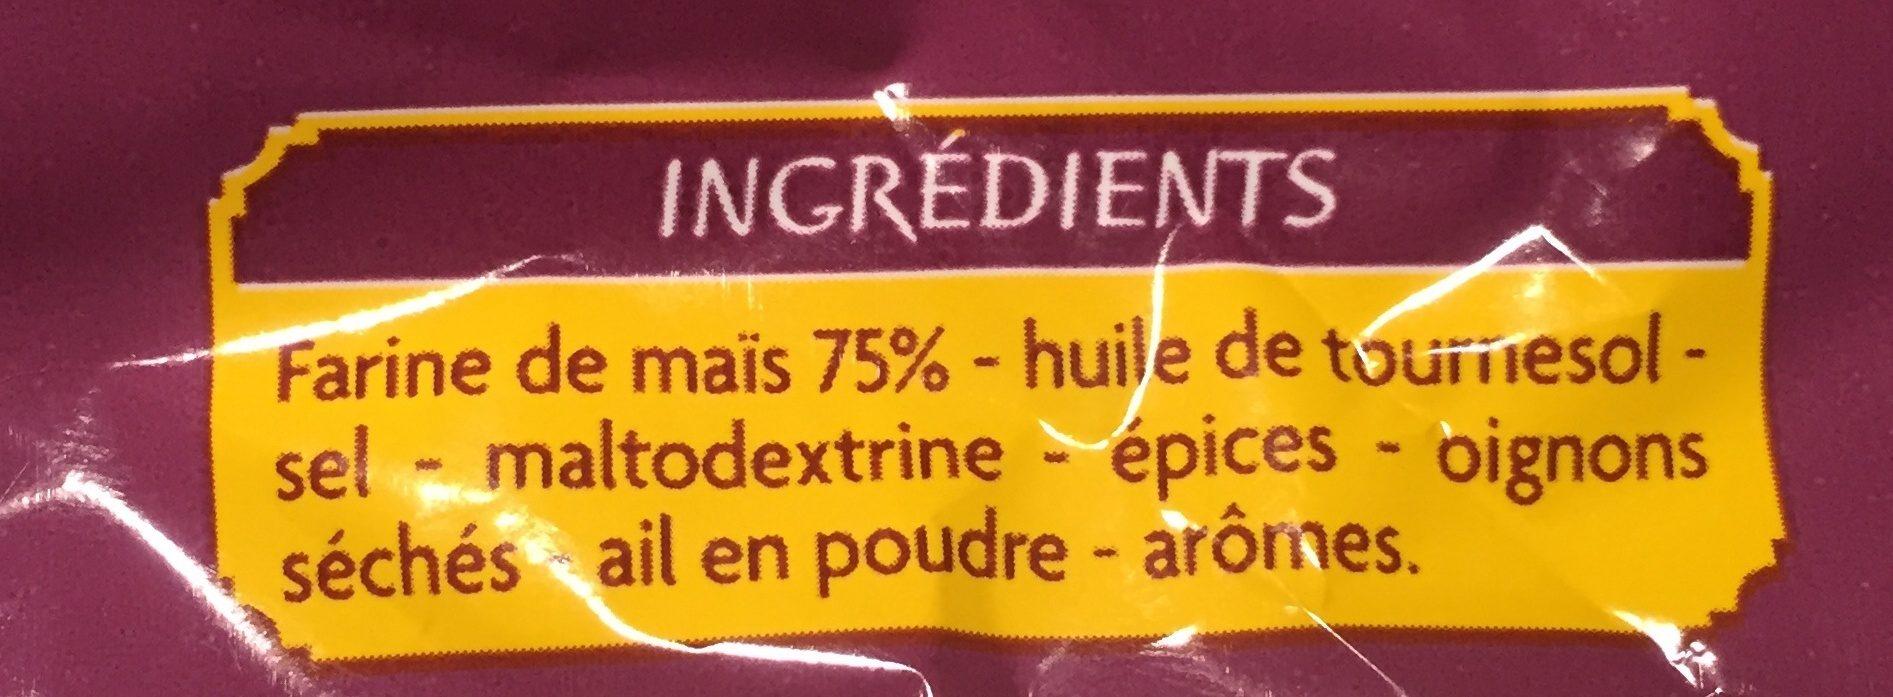 Tortillas chips gout fromage - Ingrediënten - fr